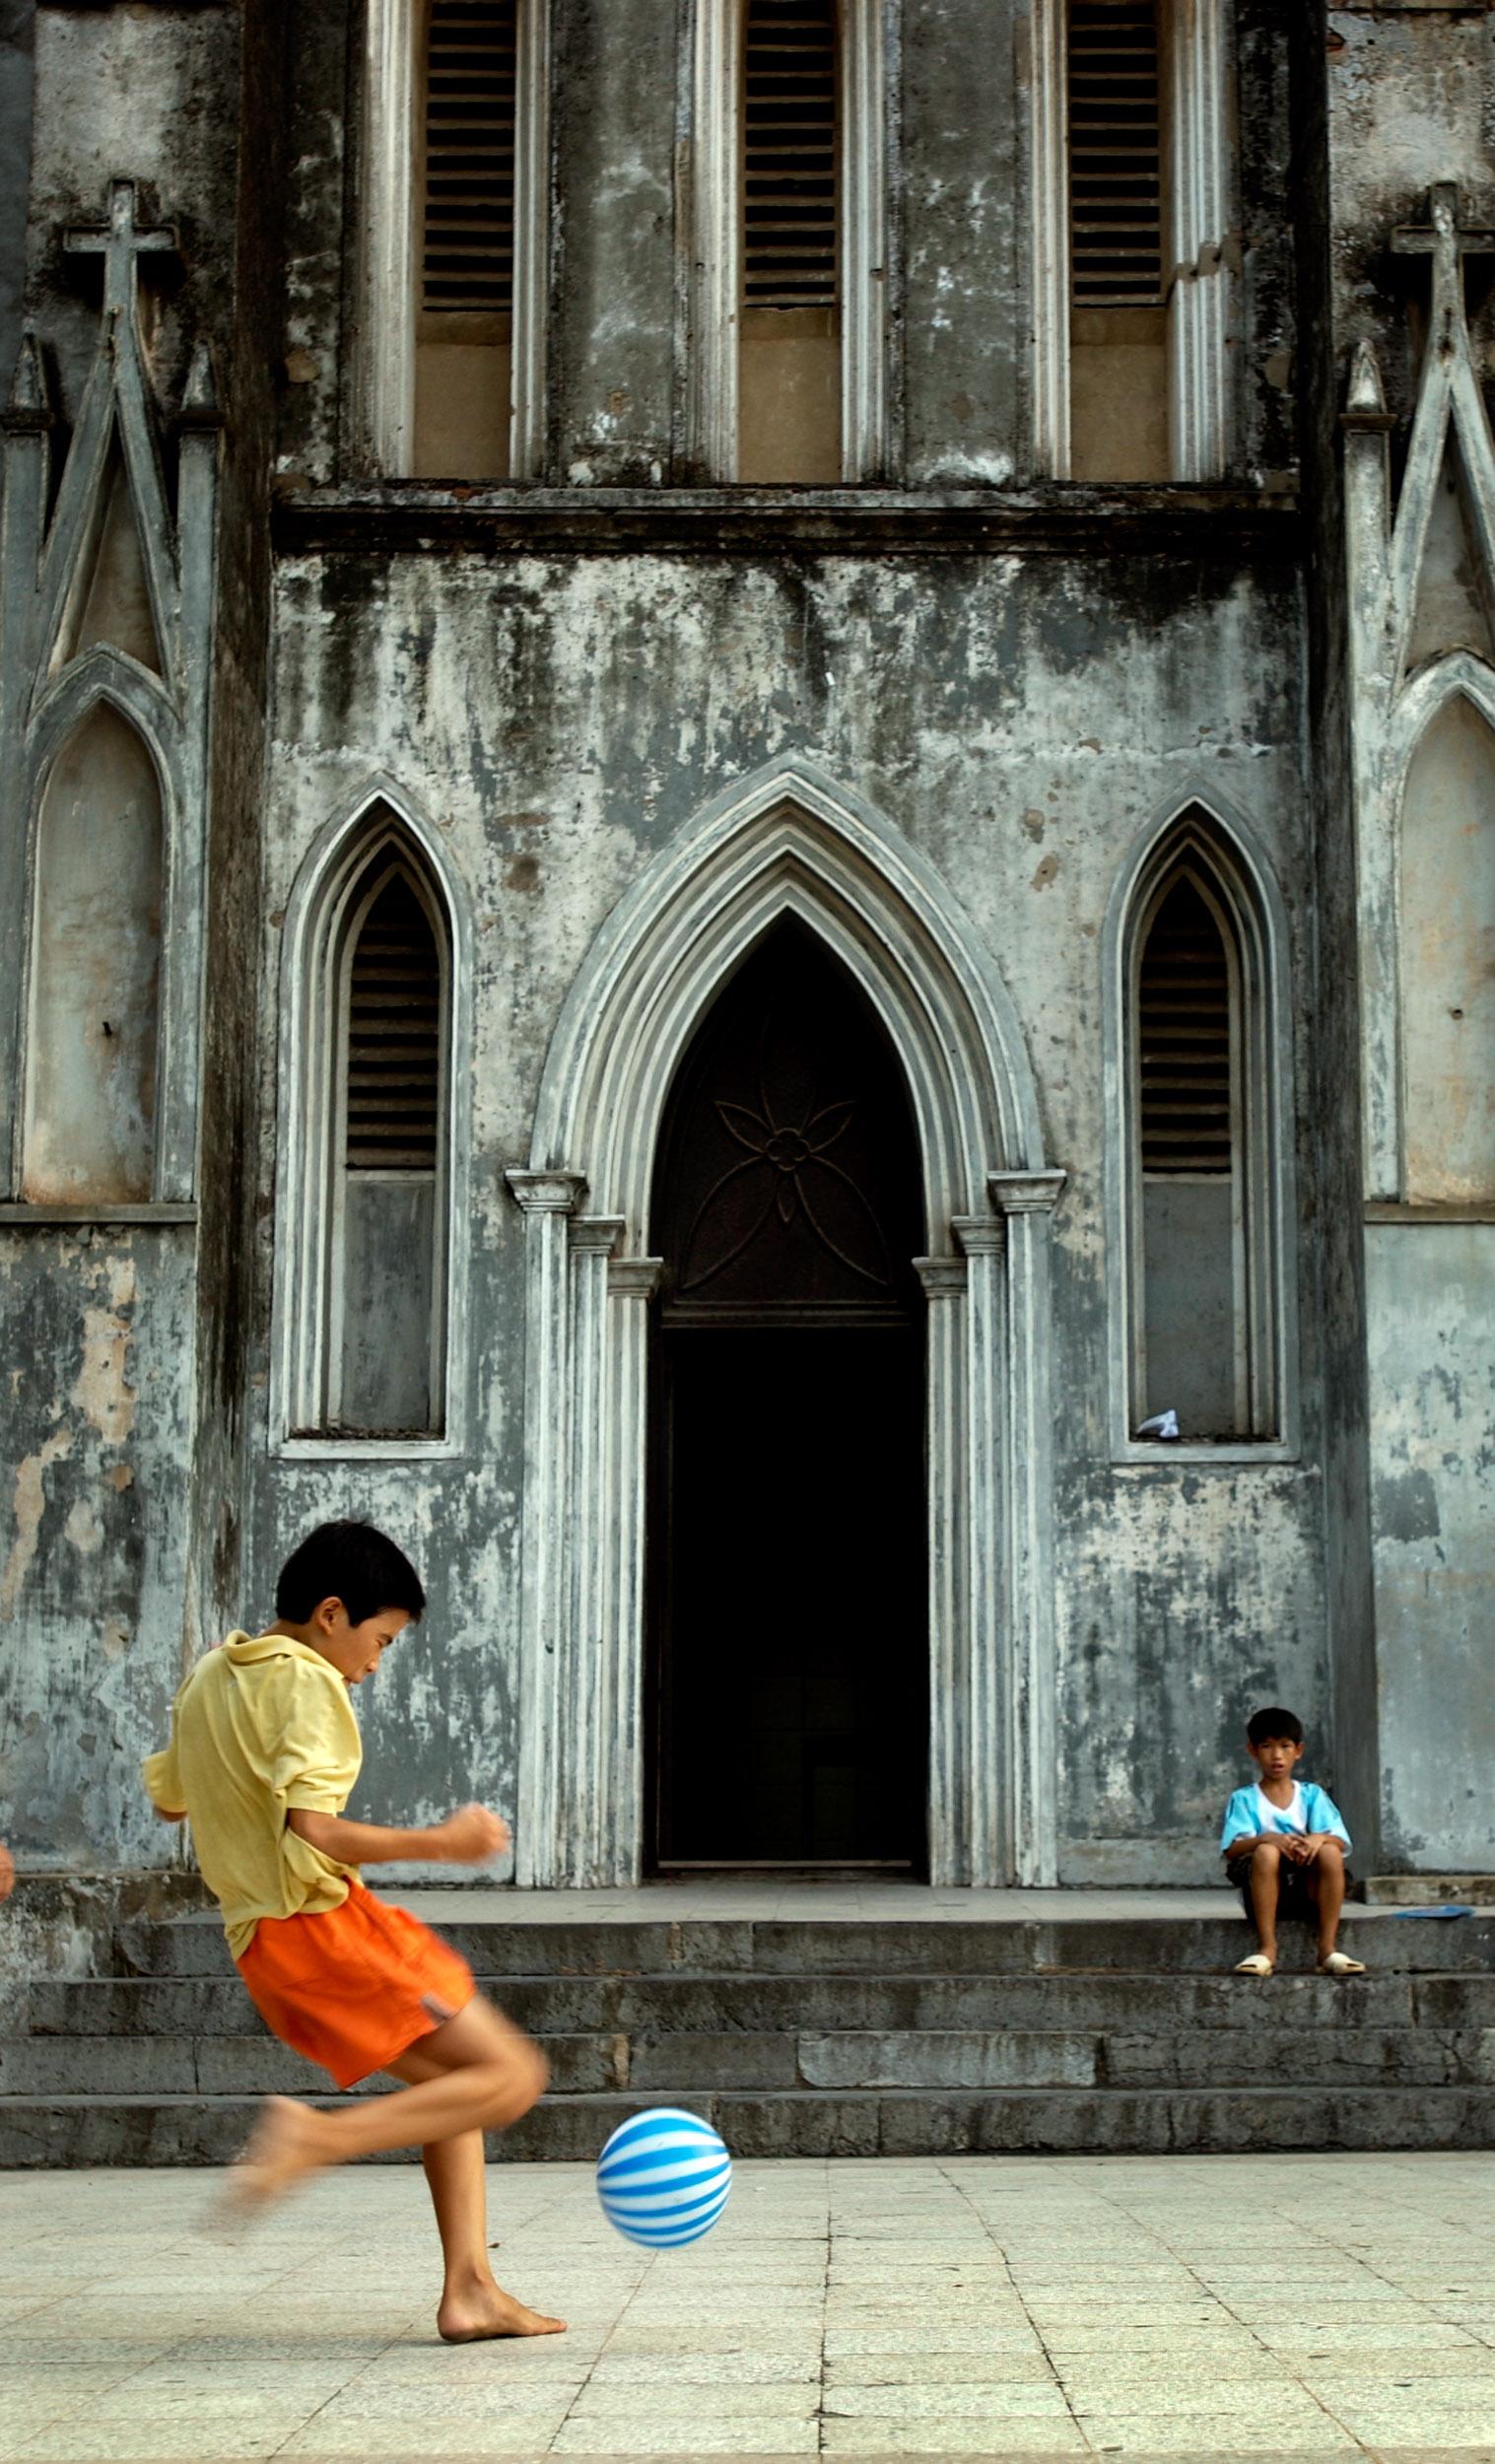 © Kevin Landwer-Johan street photography kids playing football